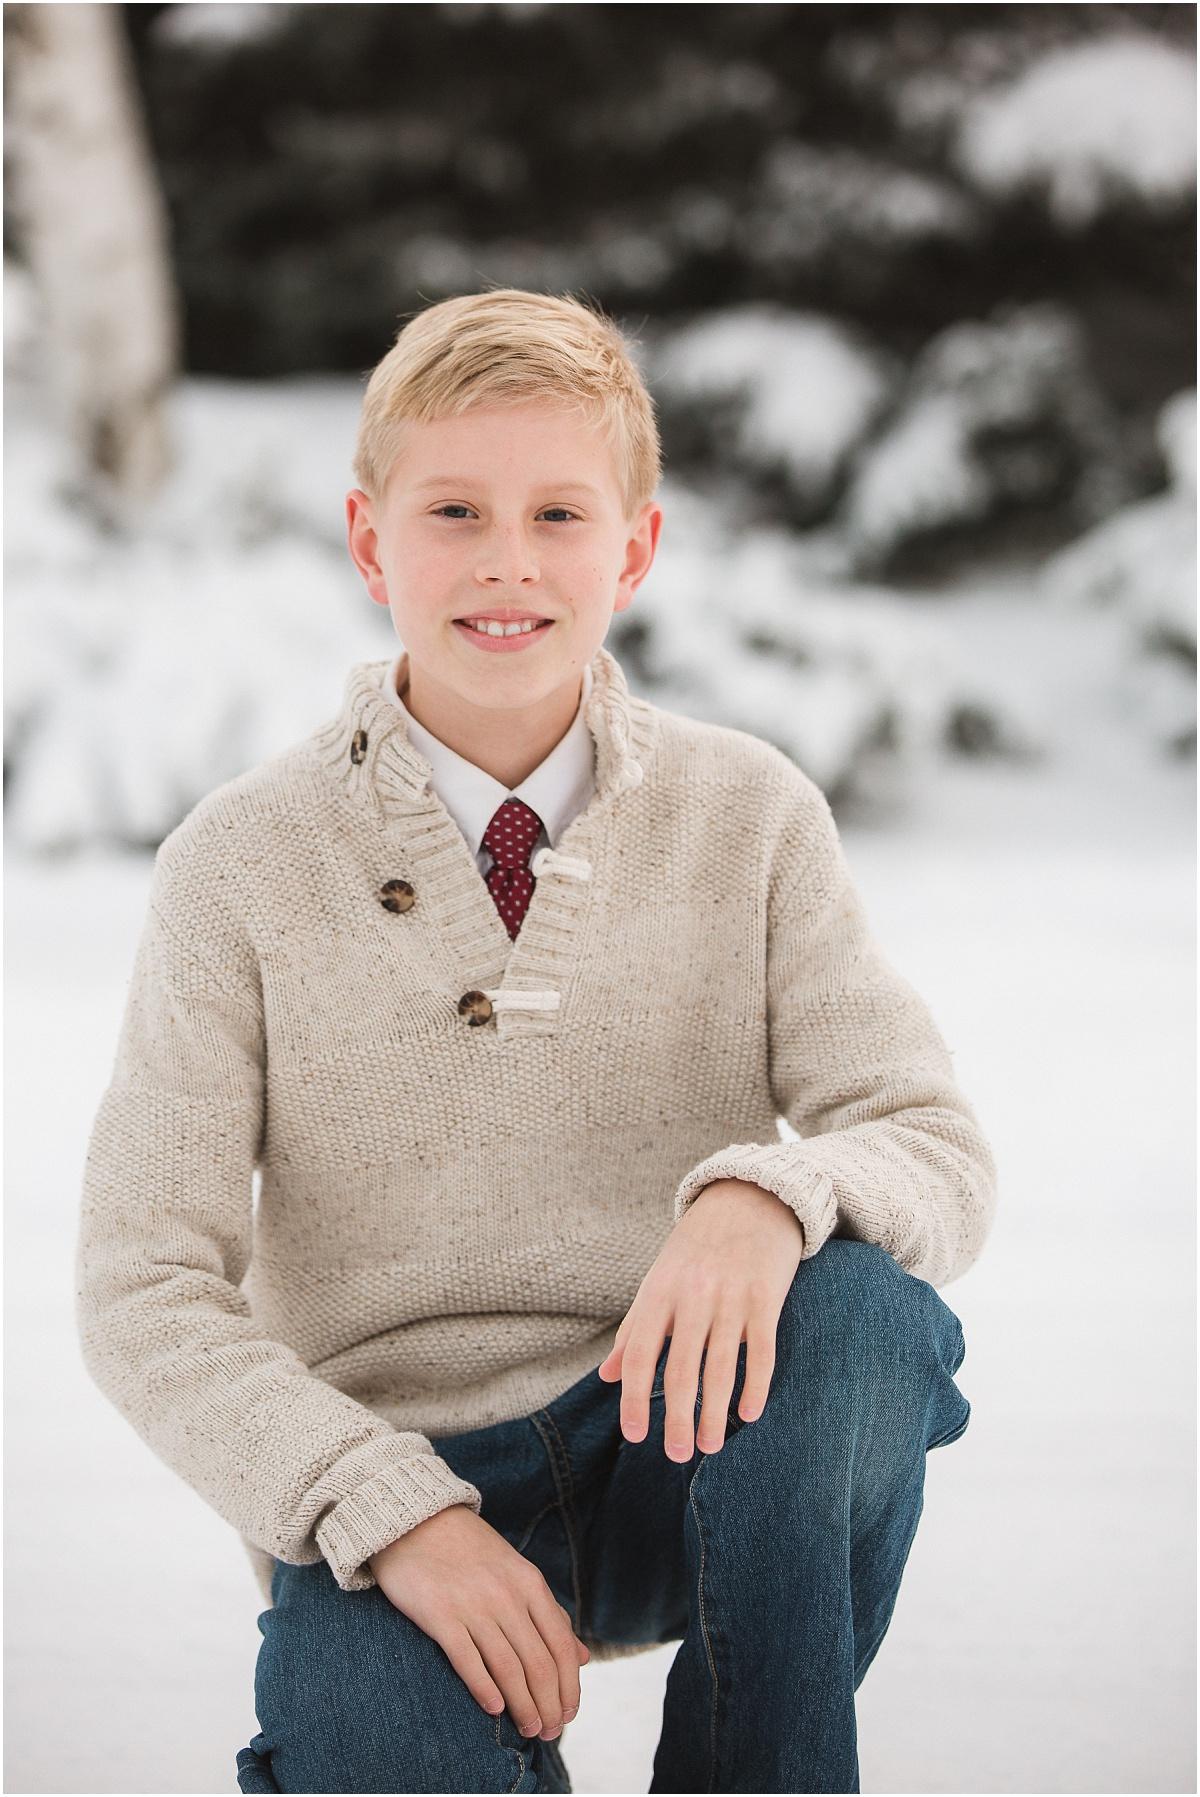 Portraits_Child Photography_Meridian Idaho__Leah Southwick Photography_0081.jpg